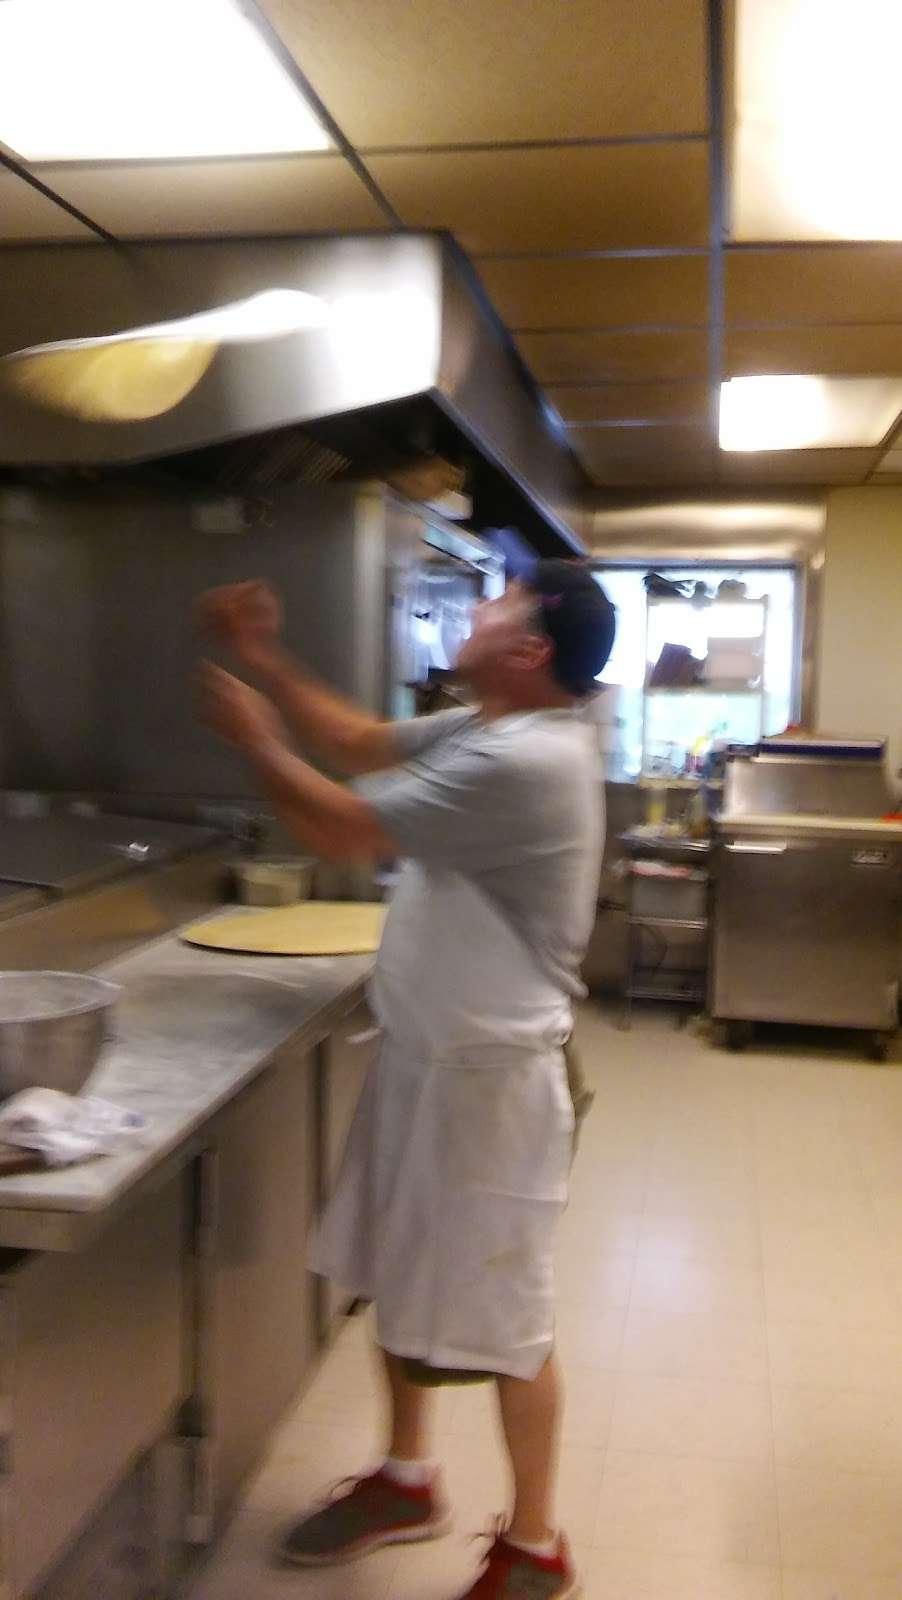 Coppolas Pizza & Restaurant - restaurant  | Photo 10 of 10 | Address: 2267 PA-447, Analomink, PA 18320, USA | Phone: (570) 420-4550